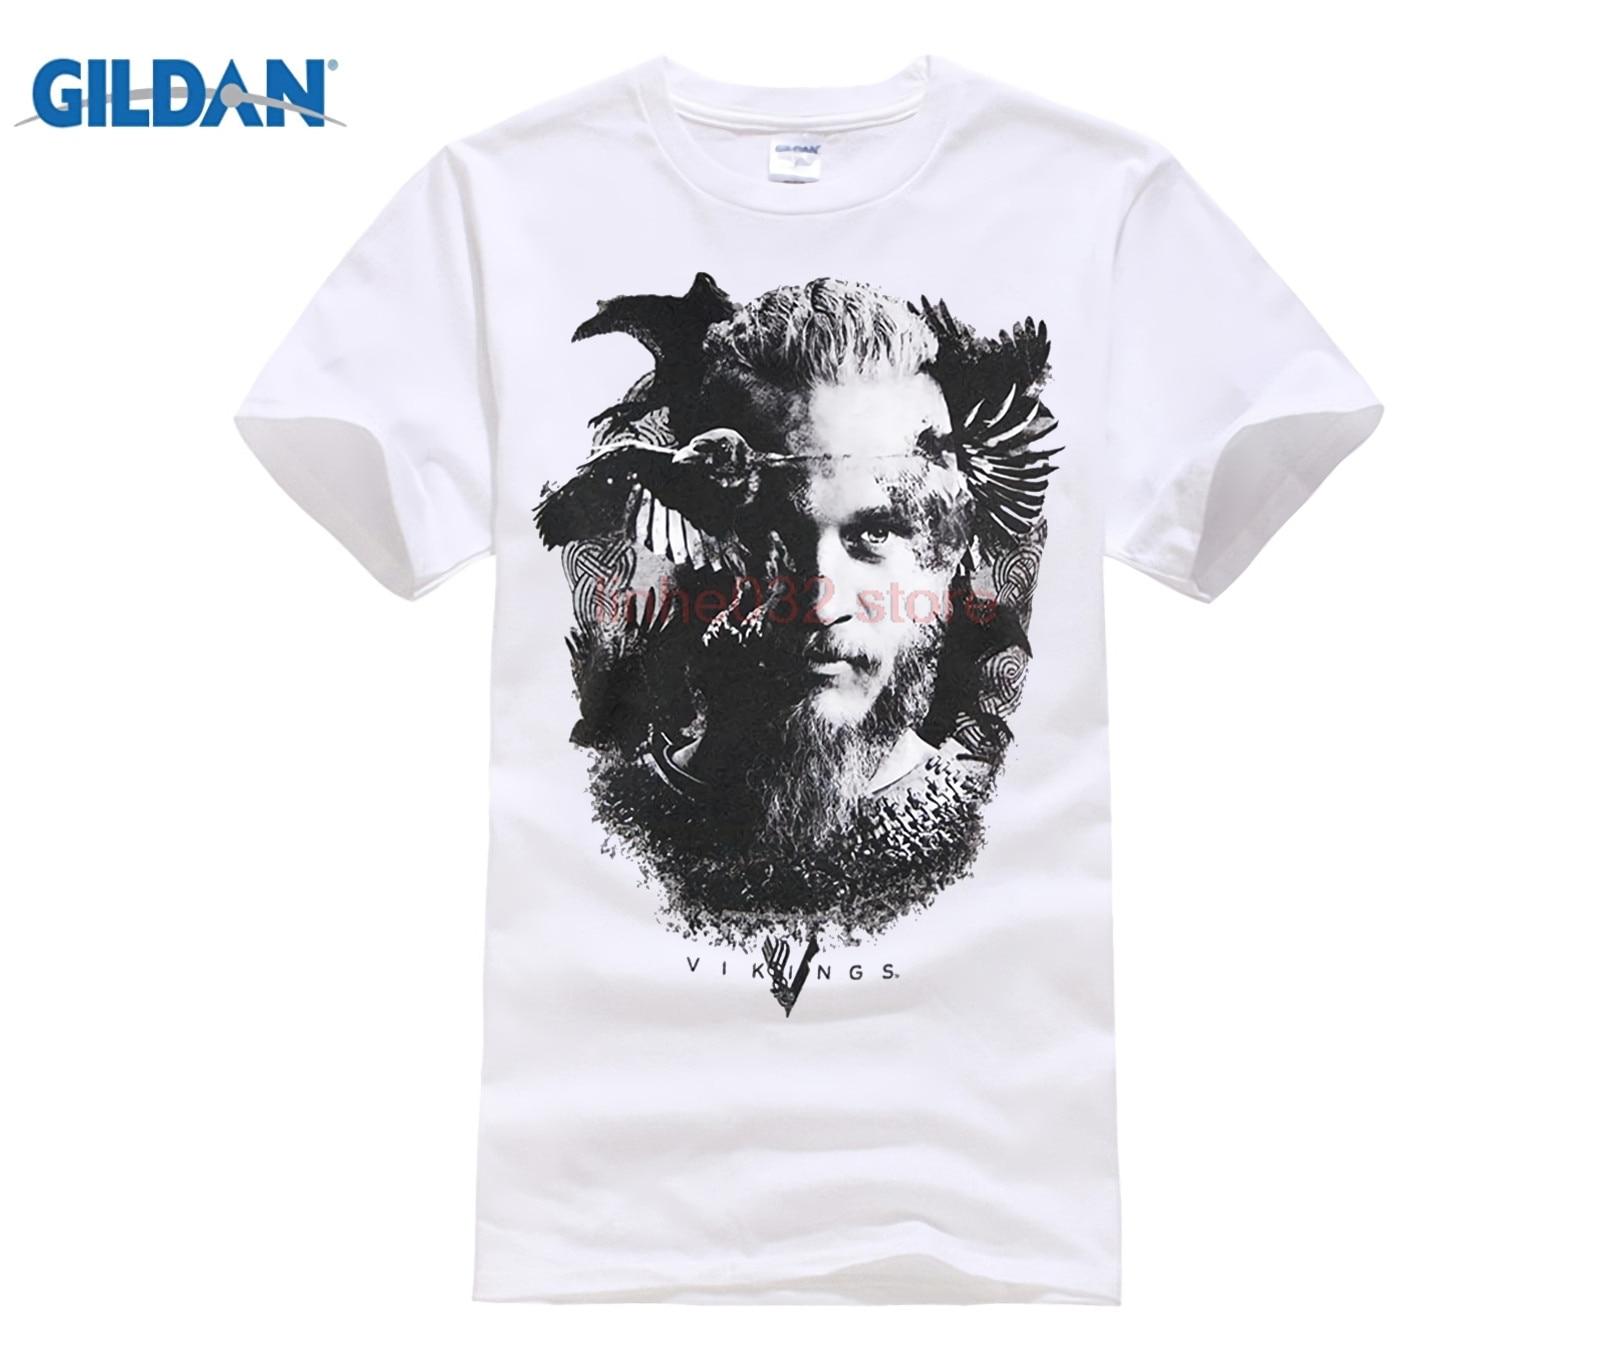 c2cc424de Mens Official Vikings TV Series Odin's Raven T Shirt Heather Grey Men T- Shirt Short Sleeve Round Neck Men O-Neck